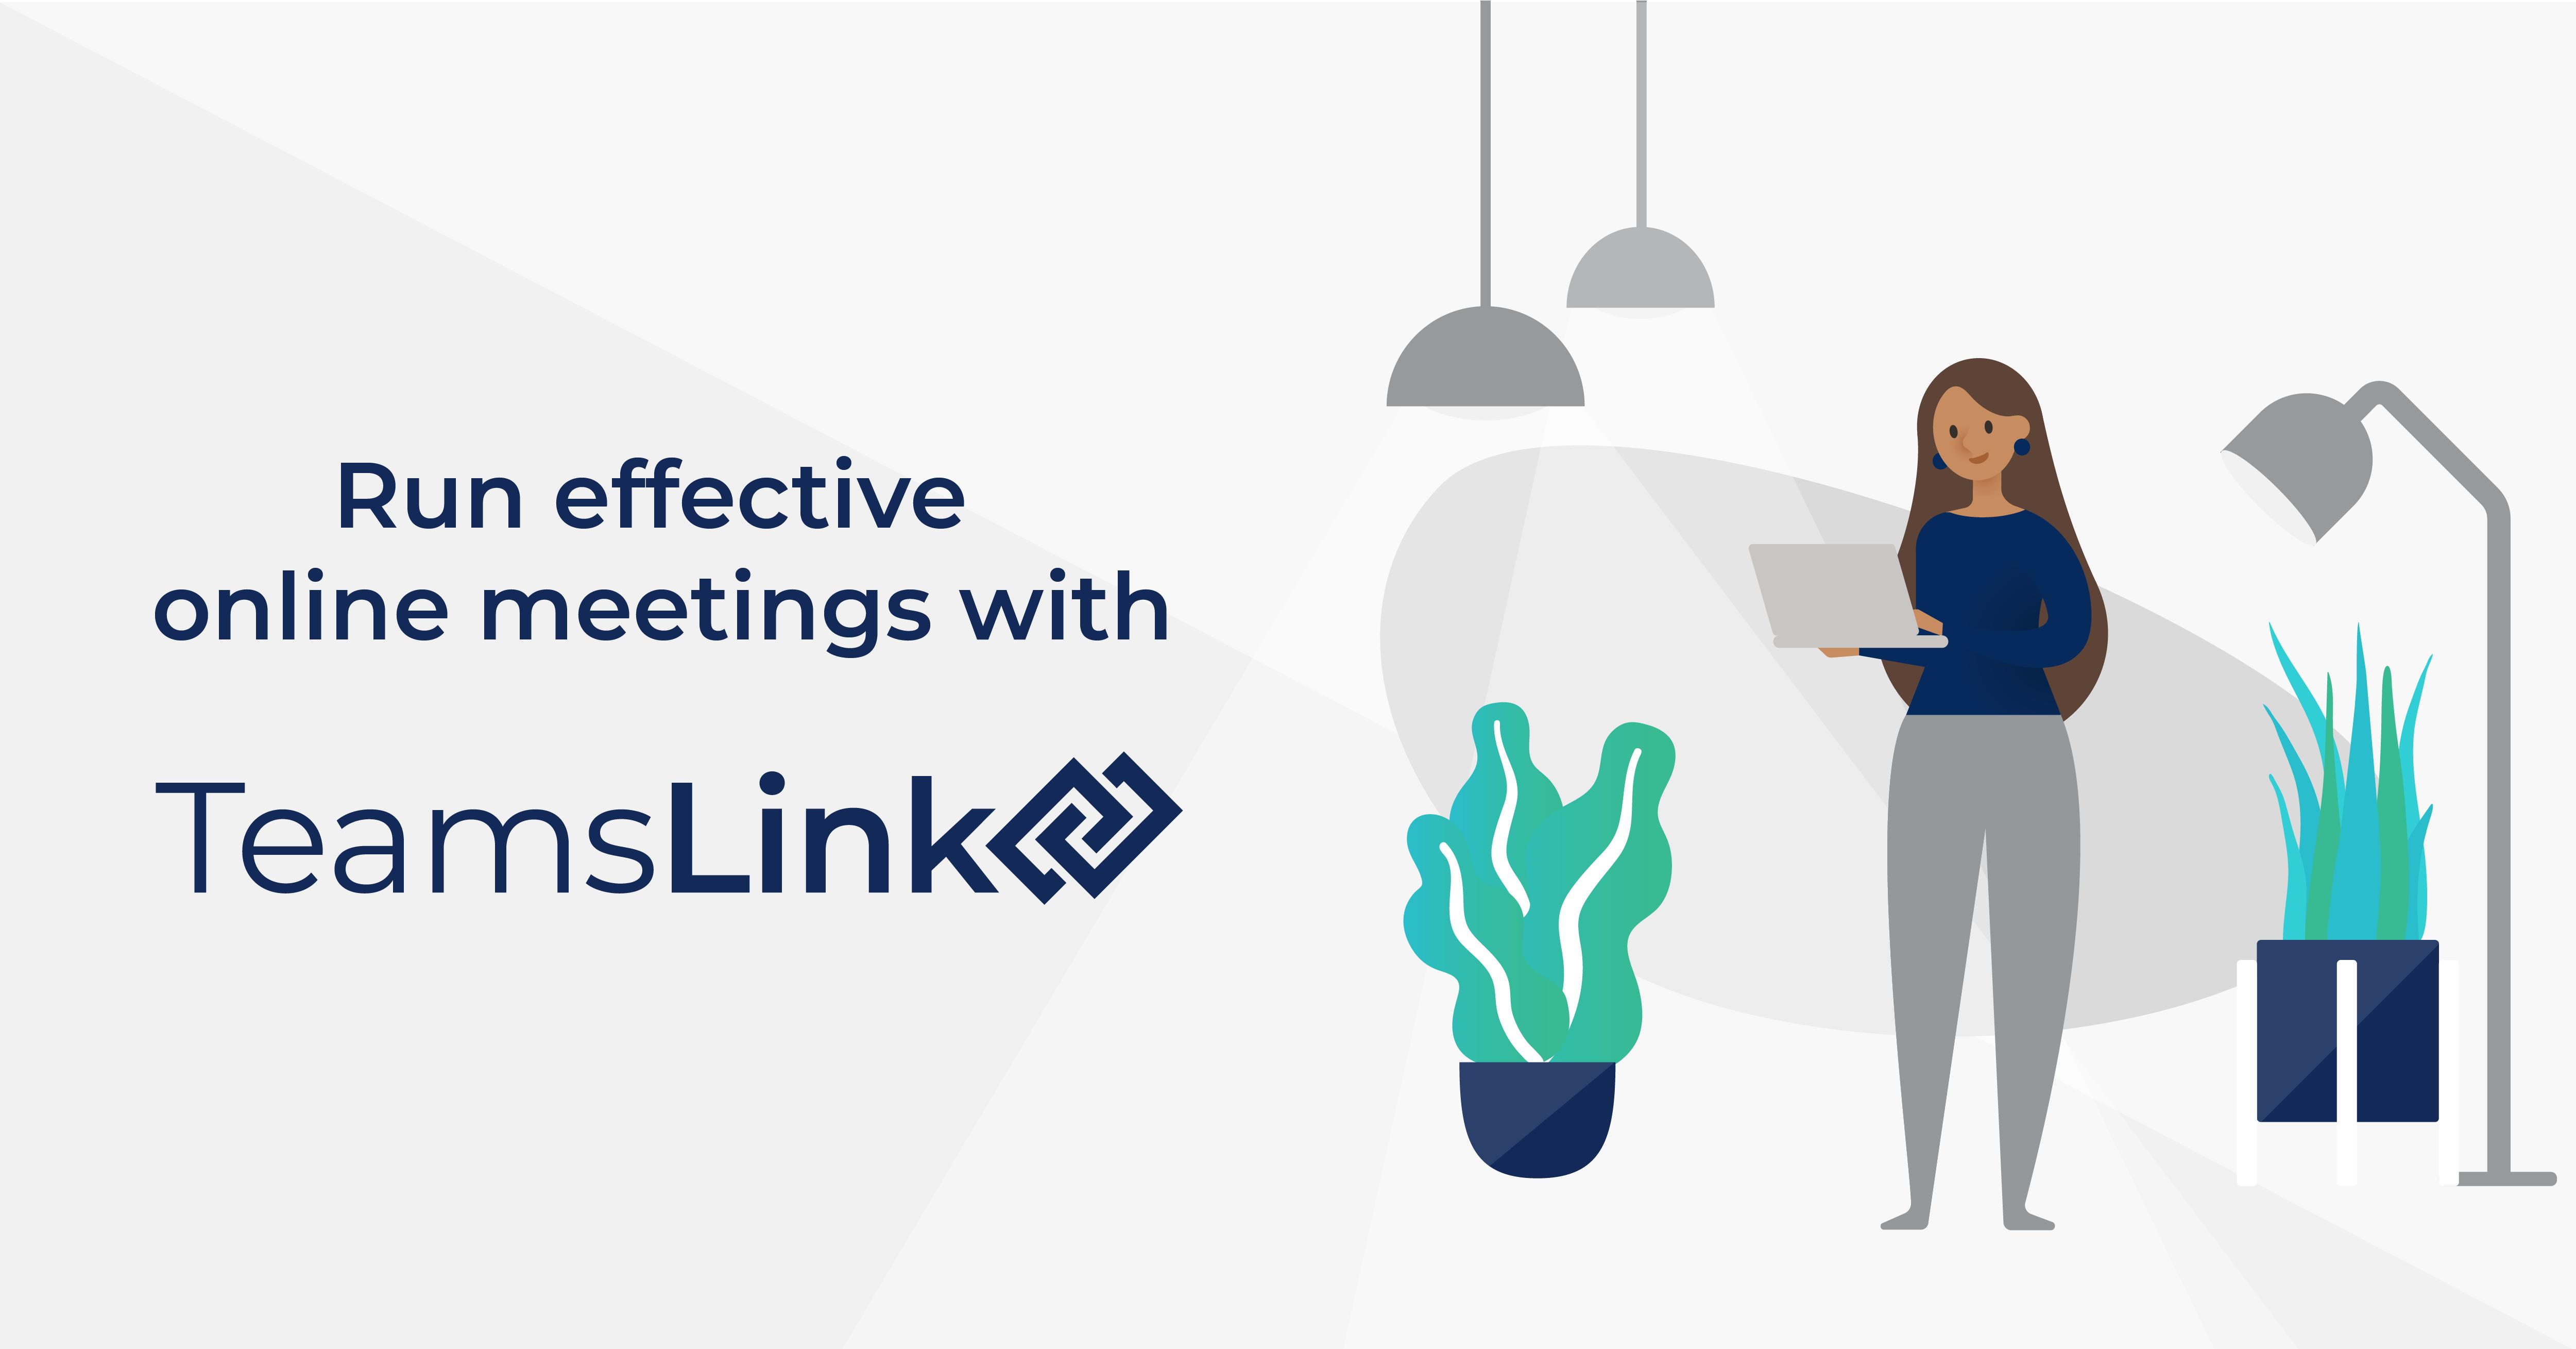 run effective online meetings social images-09